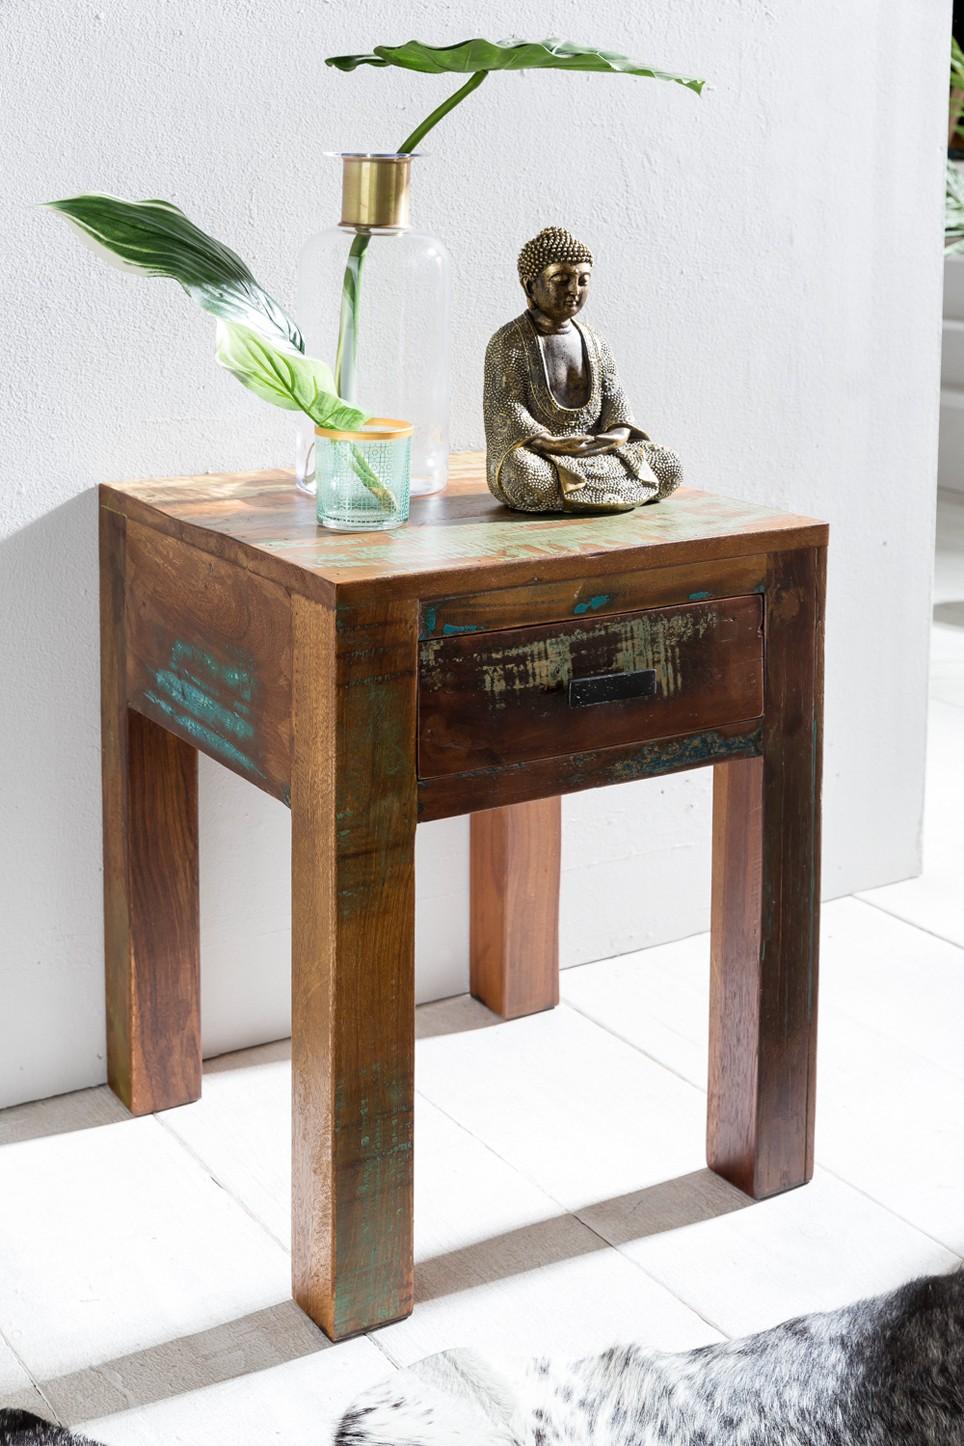 anian shabby chic nachttisch nachtschrank mango holz. Black Bedroom Furniture Sets. Home Design Ideas